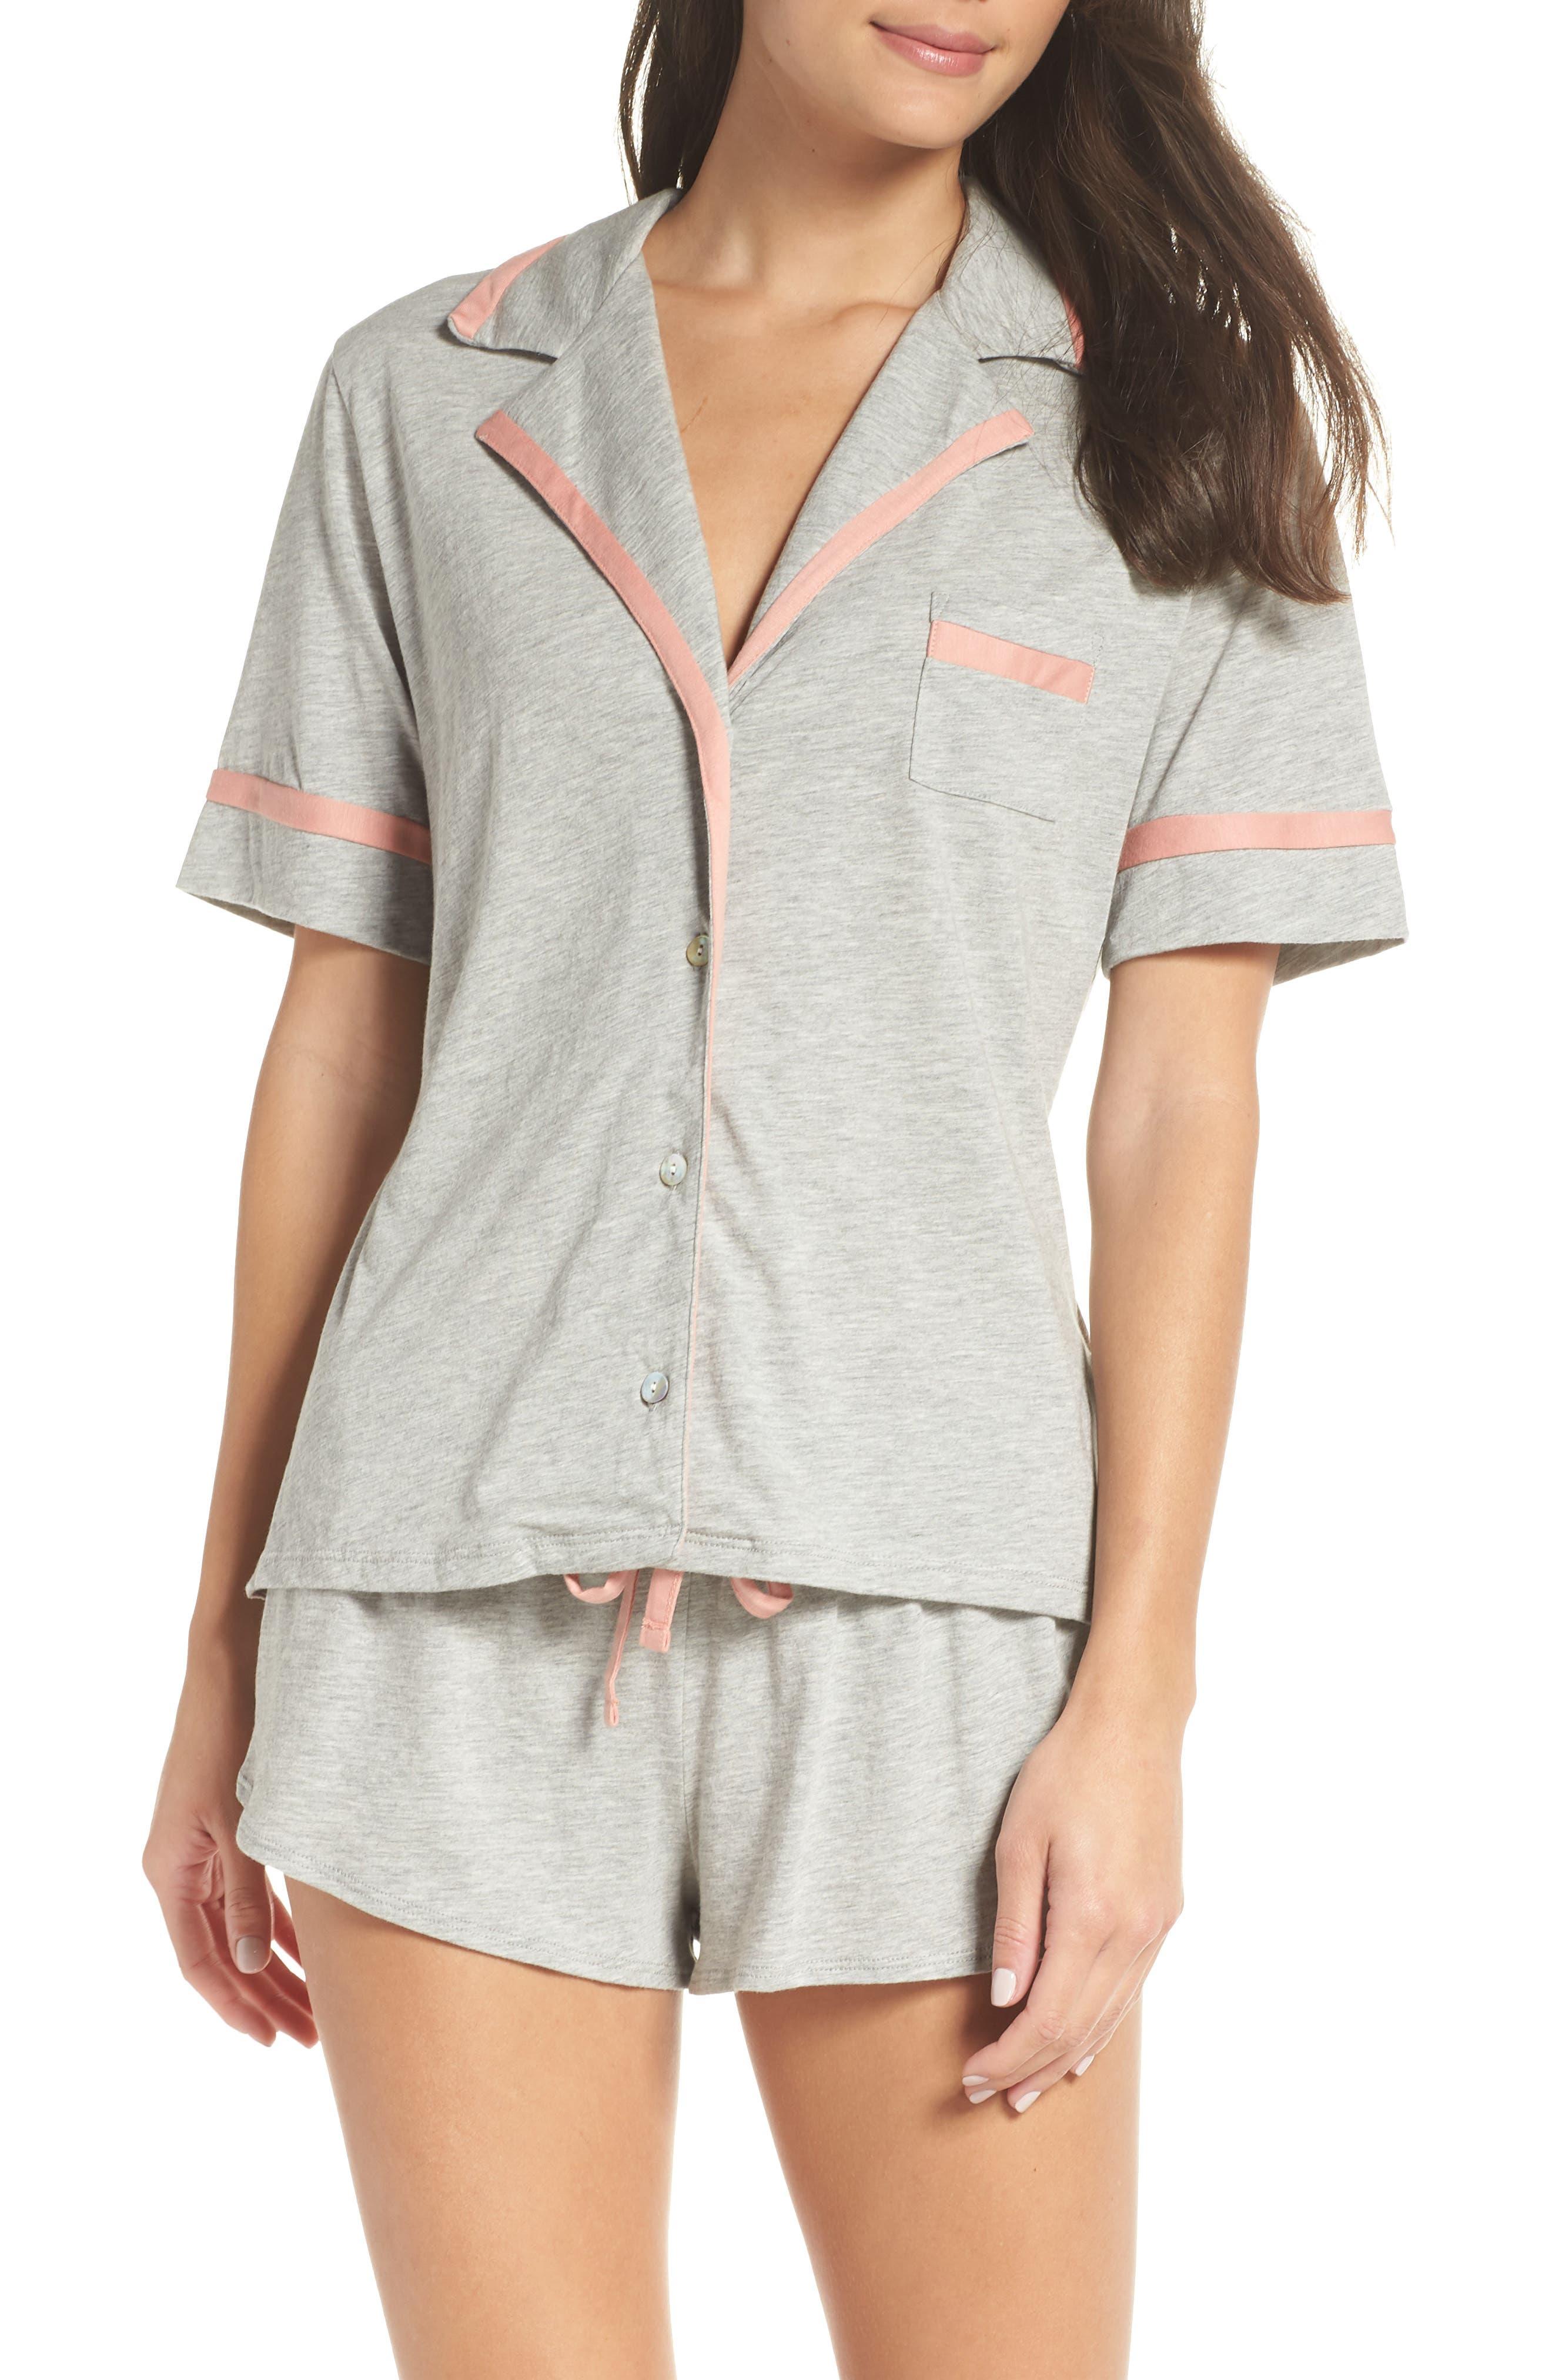 COSABELLA Amore Pajamas, Main, color, HEATHER GRAY/ MAUVELOUS